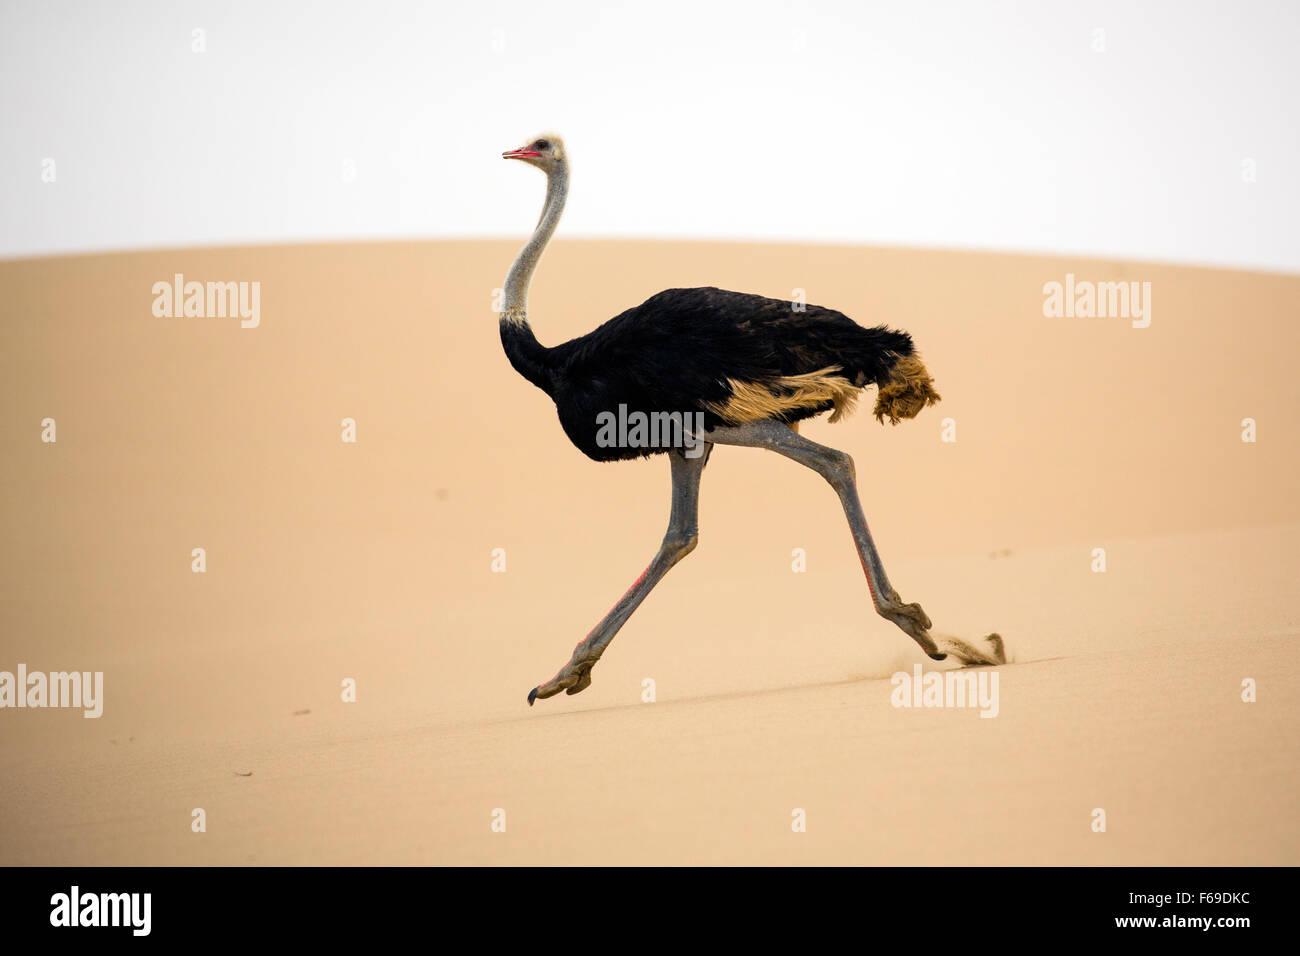 Avestruz corriendo a través de las dunas de arena de Sandwich Harbour, Namibia, Africa Foto de stock